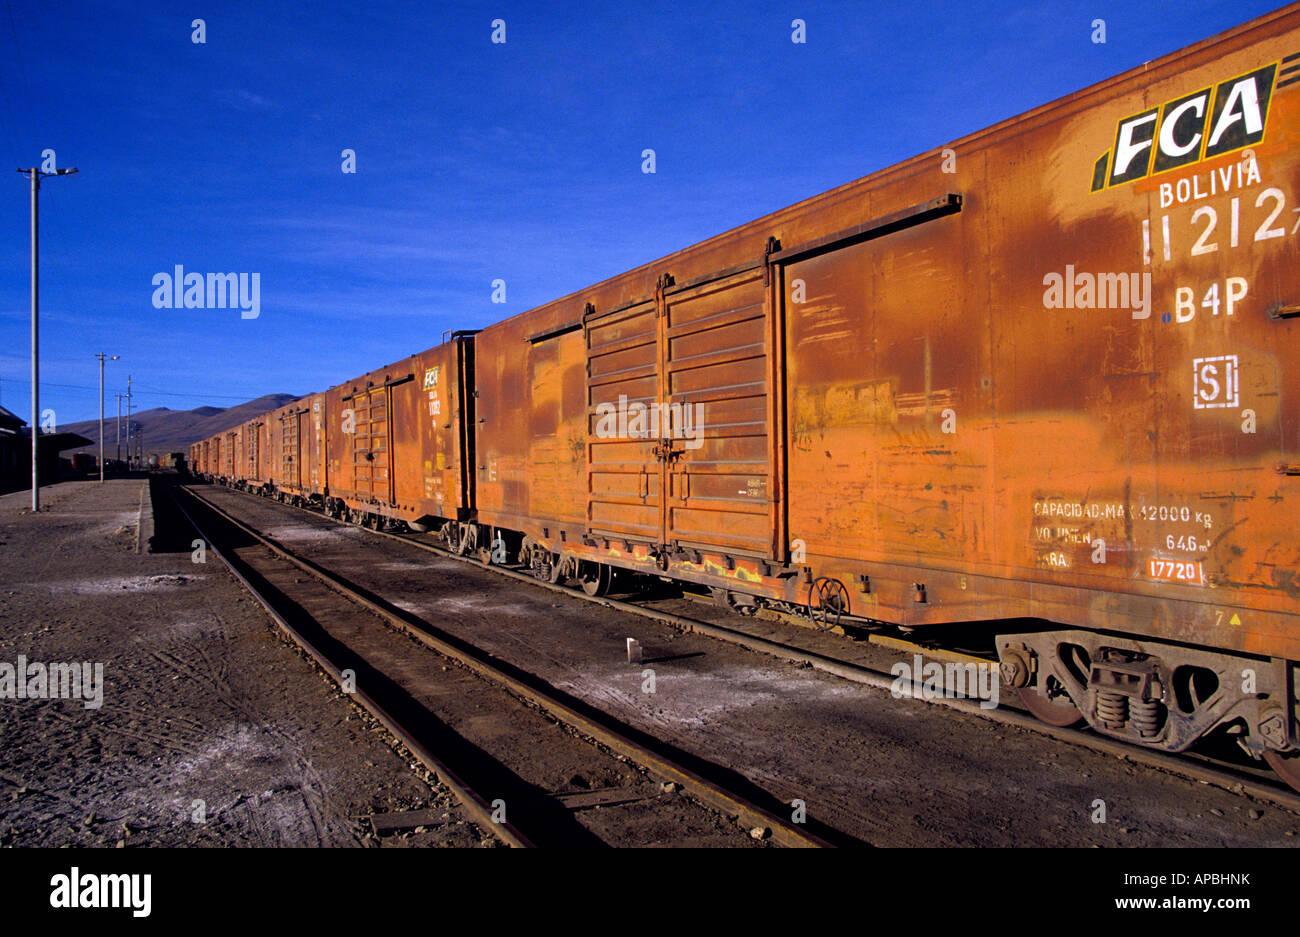 A working freight cargo train in Uyuni train station - Stock Image